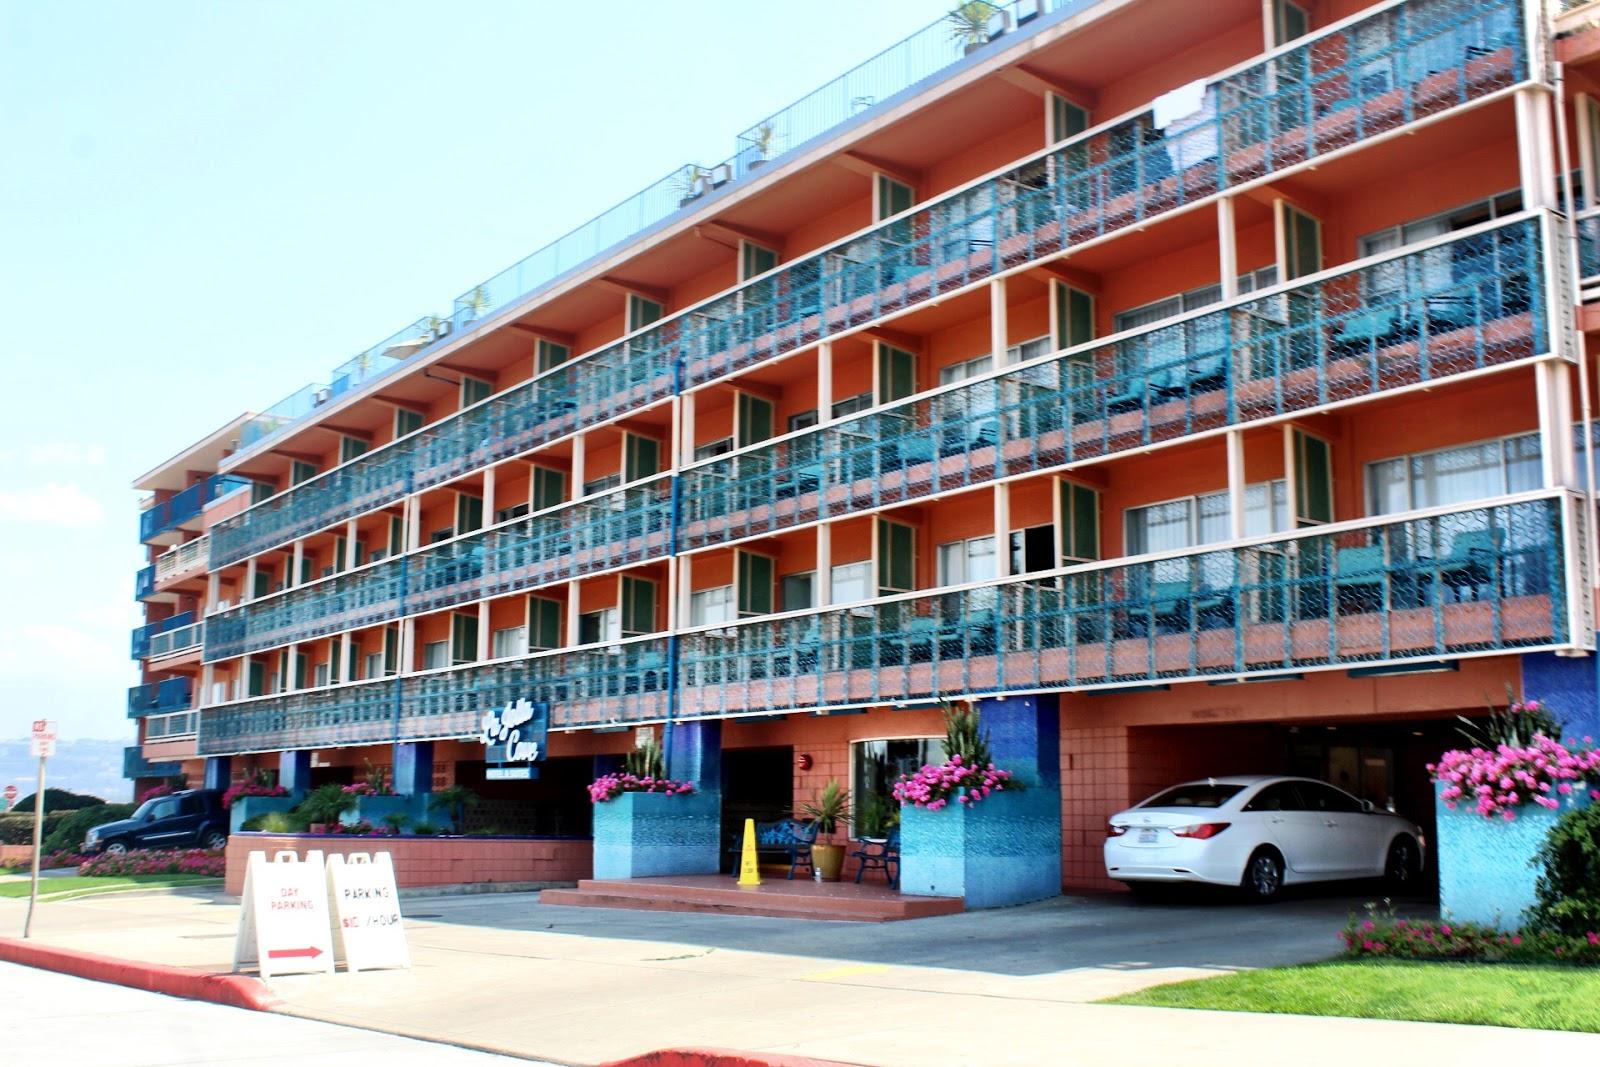 Evan and Lauren\'s Cool Blog: 9/16/17: La Jolla Cove Hotel and Suites ...